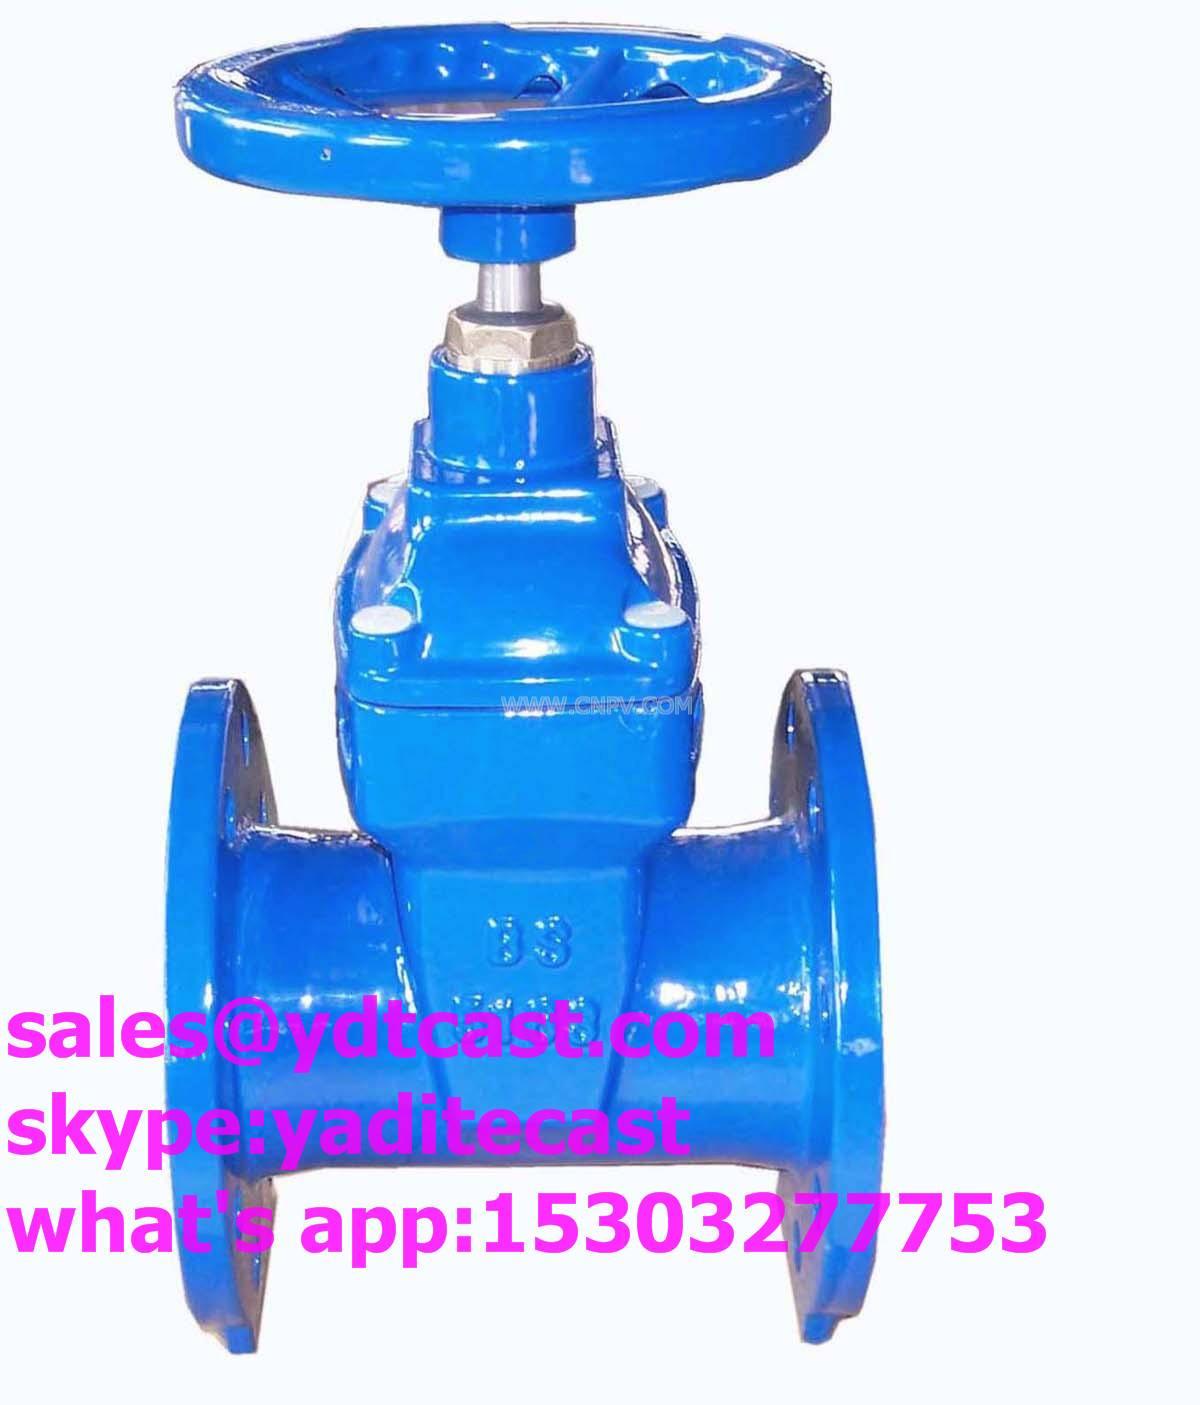 din3352 f4/f5 gate valve DN40-200 soft seal no-rising